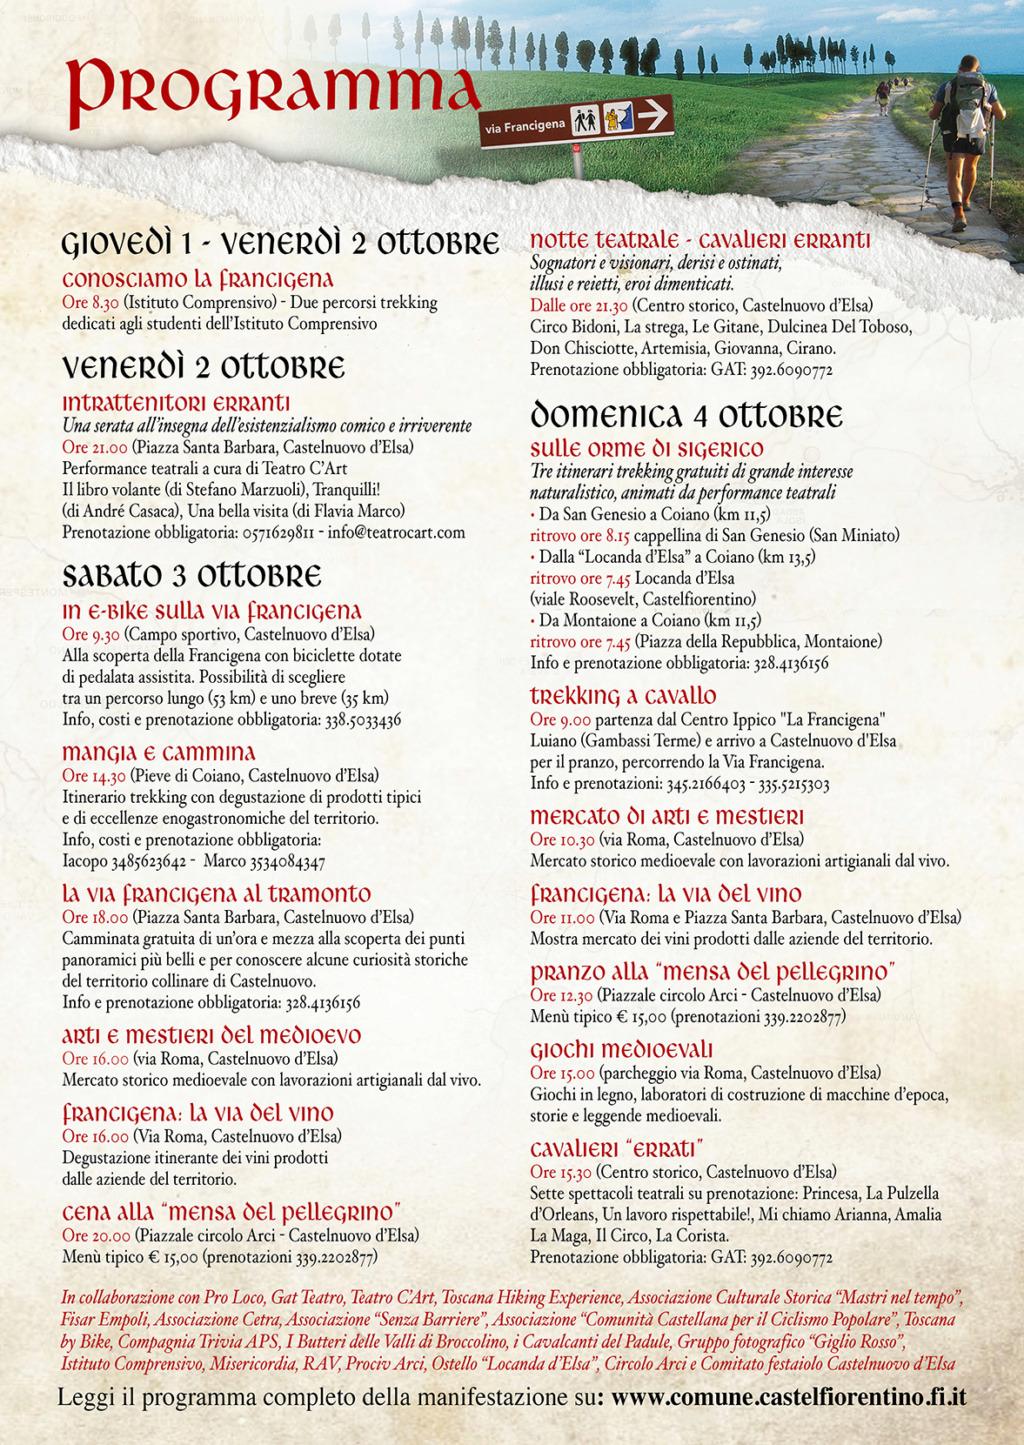 La Via Francigena in Valdelsa Progra10